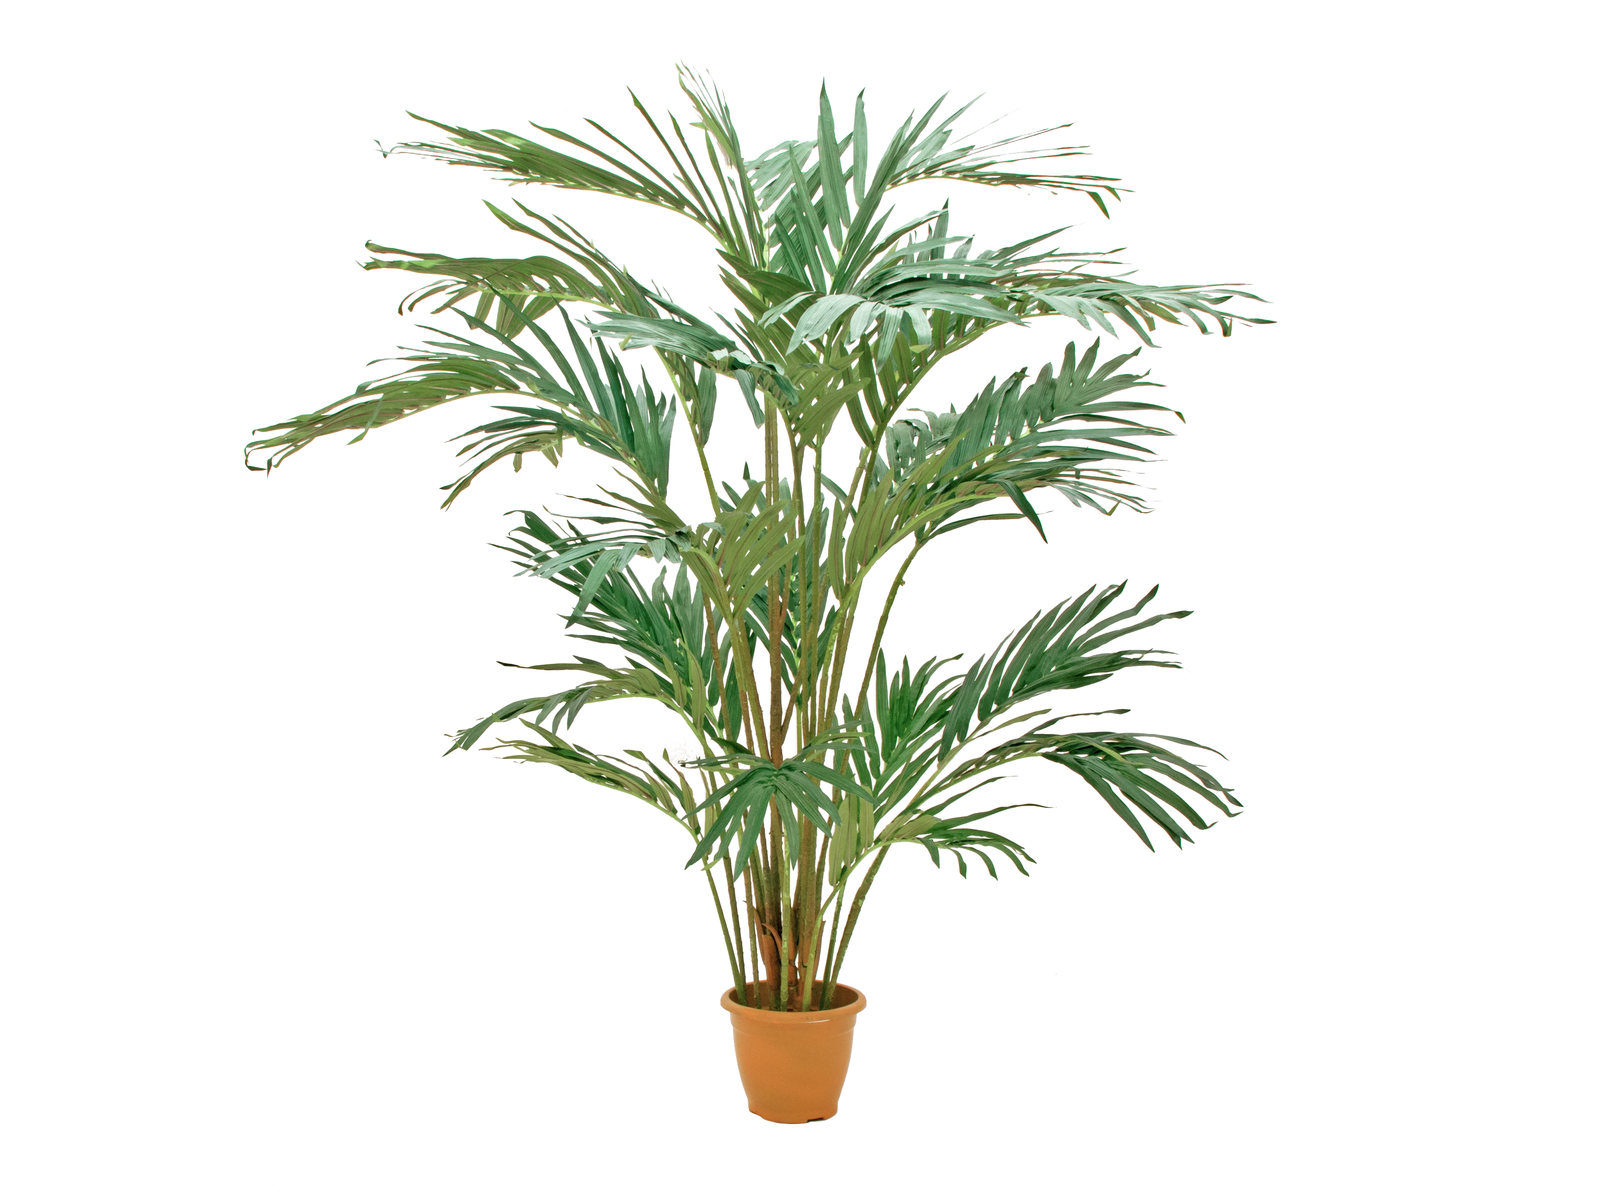 EUROPALMS Canary date palm, artificial plants, 240cm